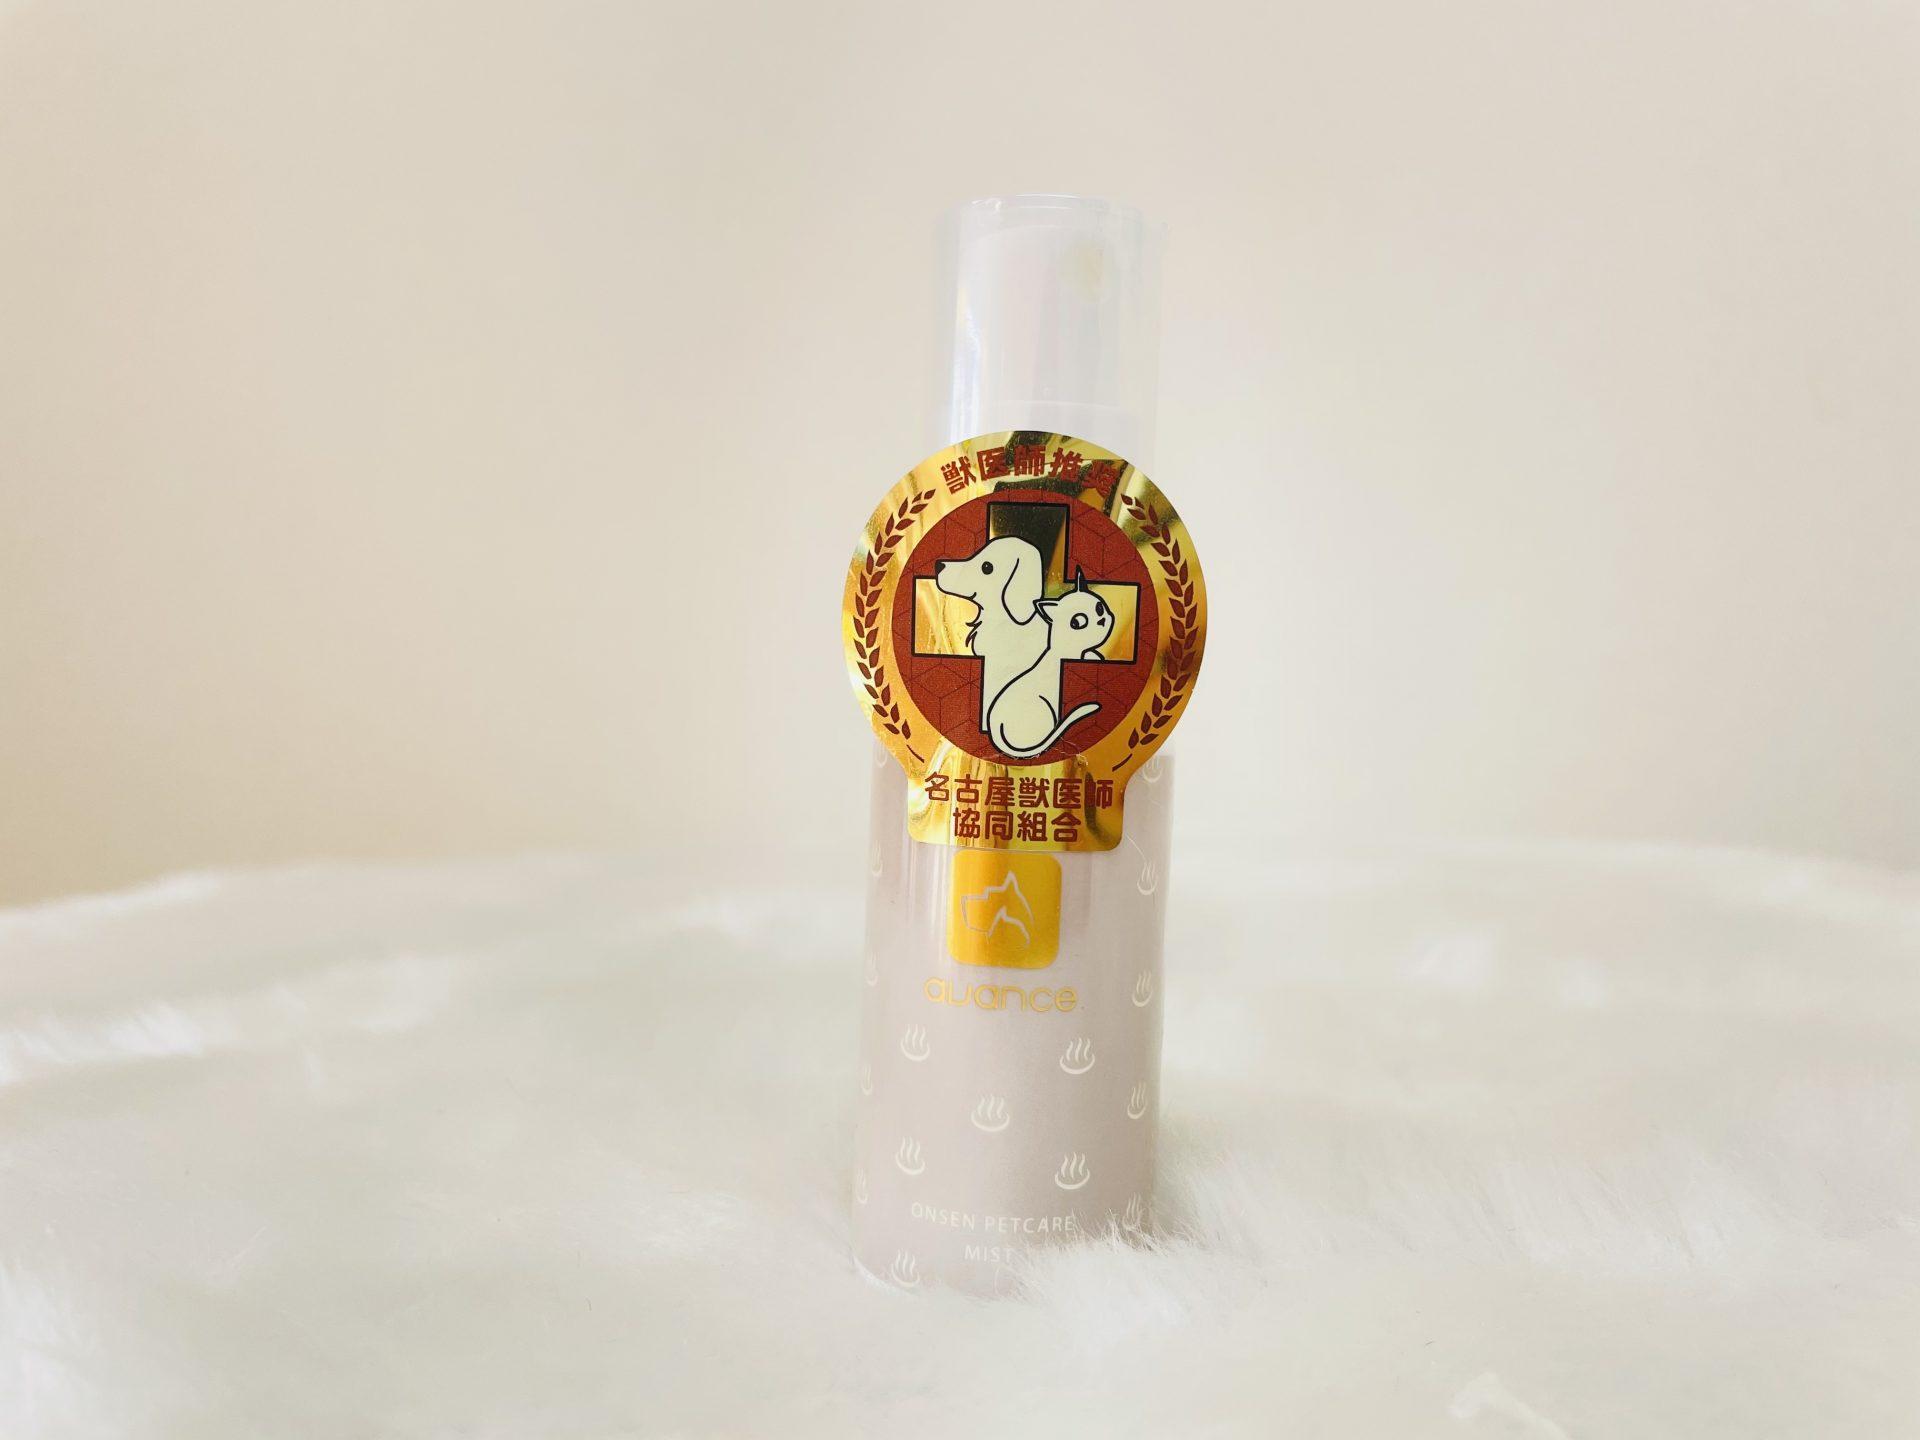 AVANCE(アヴァンス) ペット用 塗る温泉30ml